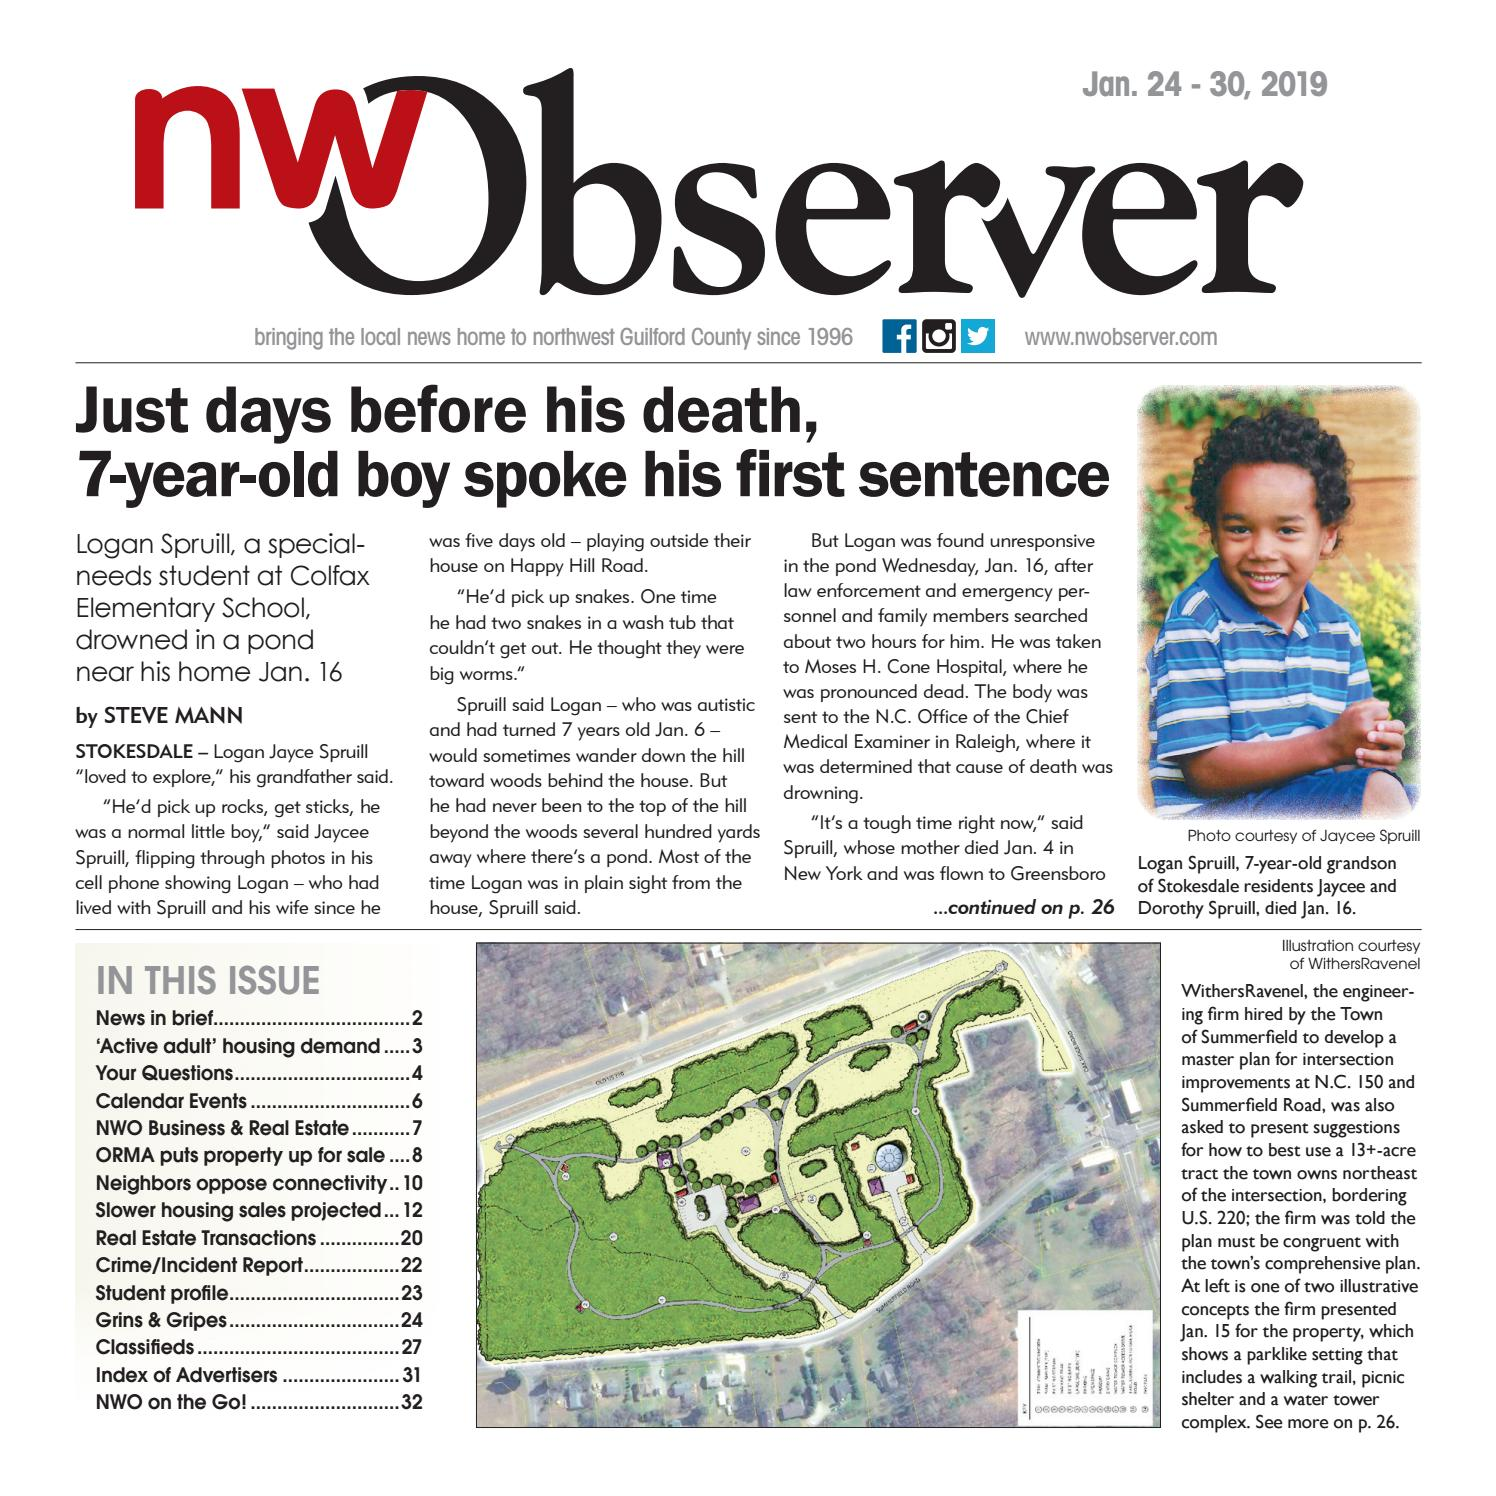 Northwest Observer I Jan  24 - Jan  30, 2019 by pscommunications - issuu